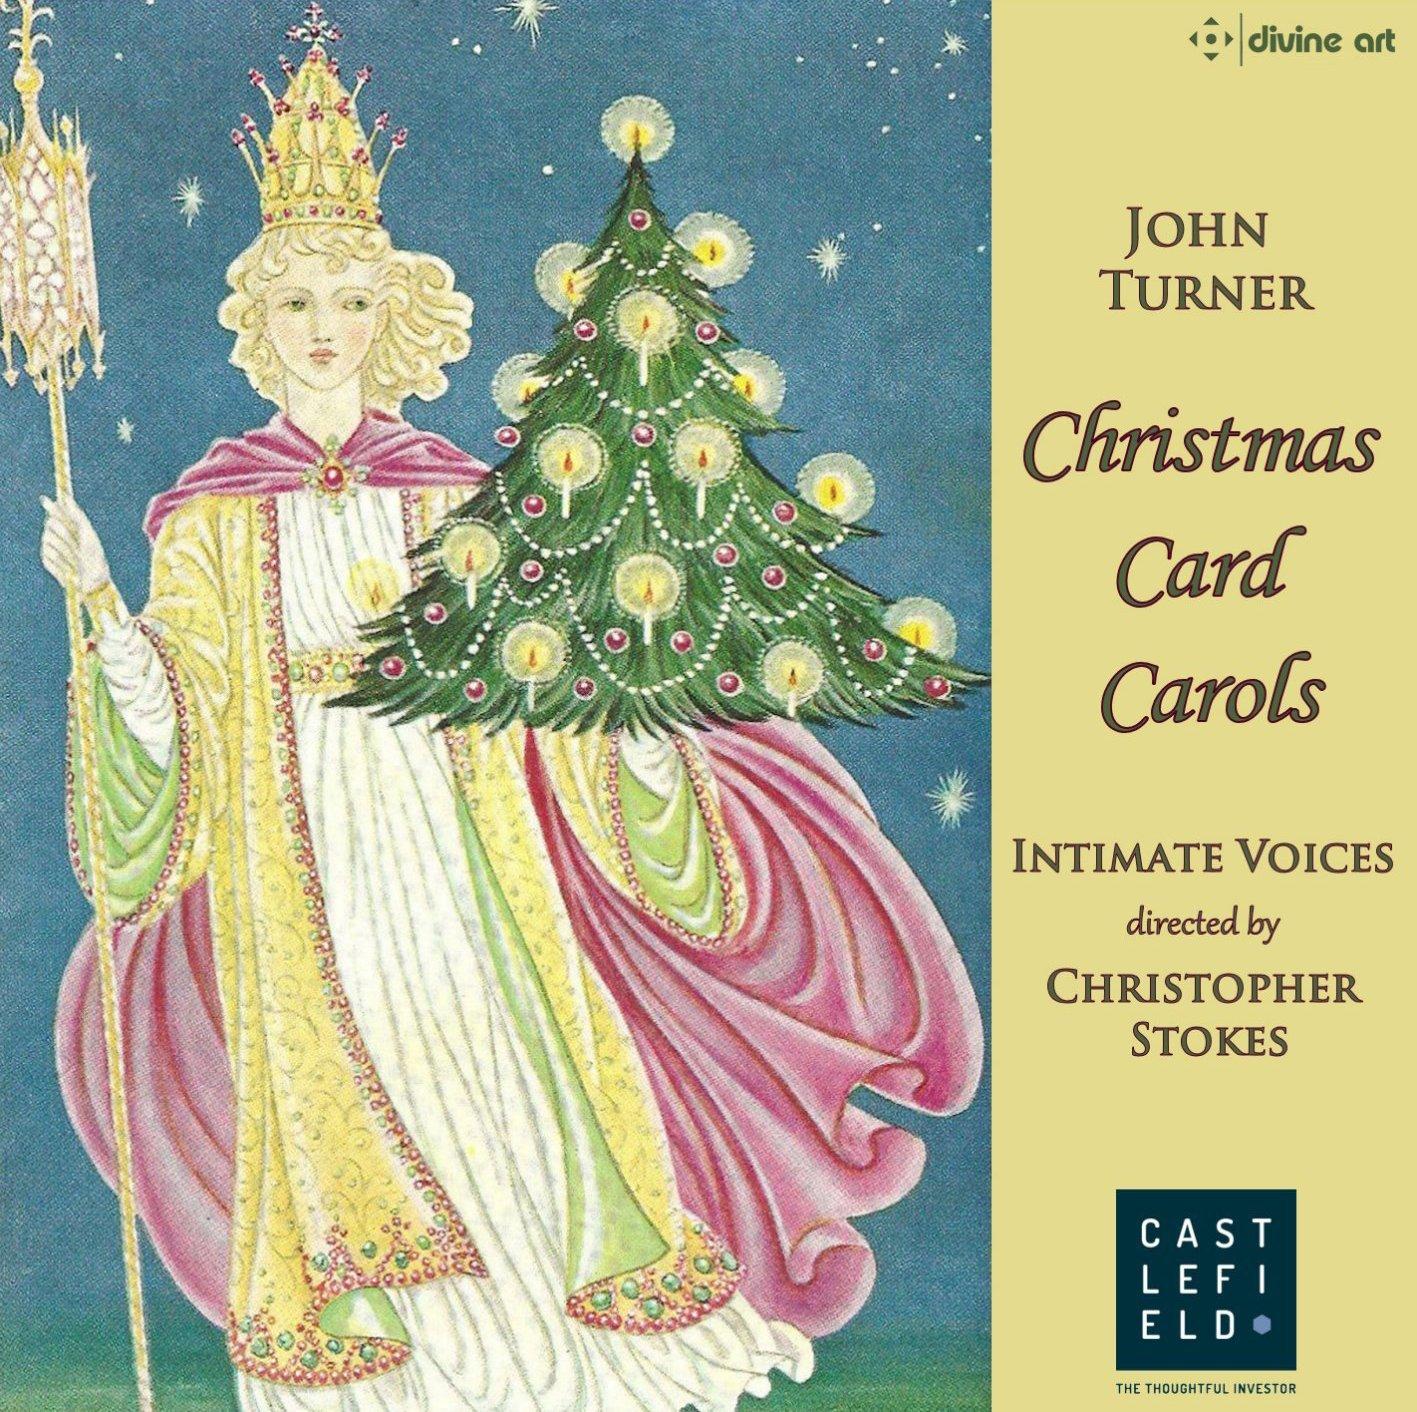 Intimate Voices, John Turner, __ - Christmas Card Carols - Amazon ...